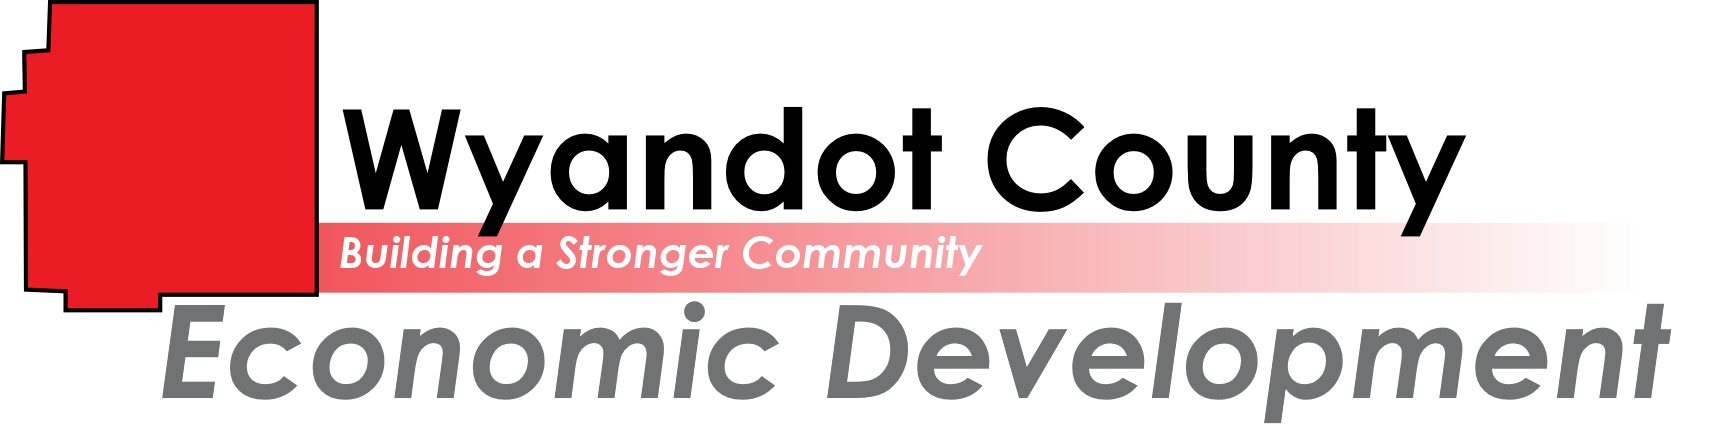 Programs Wyandot County Economic Development